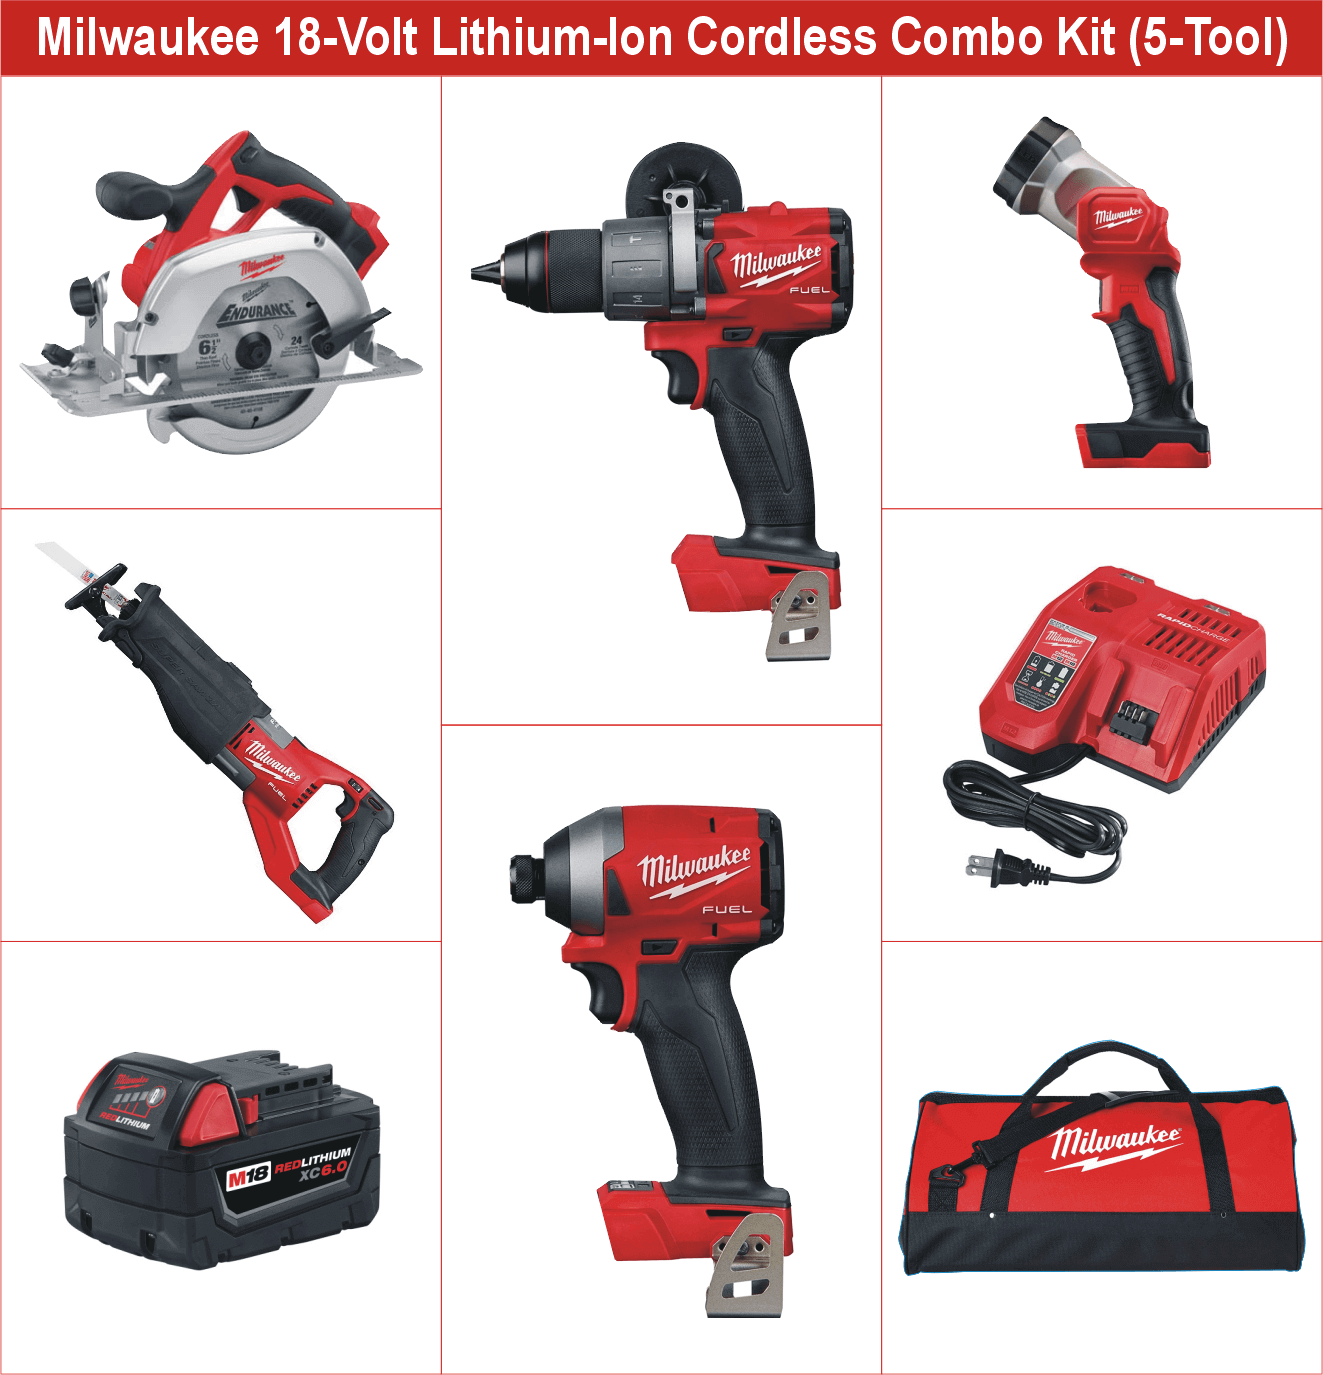 milwaukee-18-volt-lithium-ion-cordless-combo-kit-5-tool